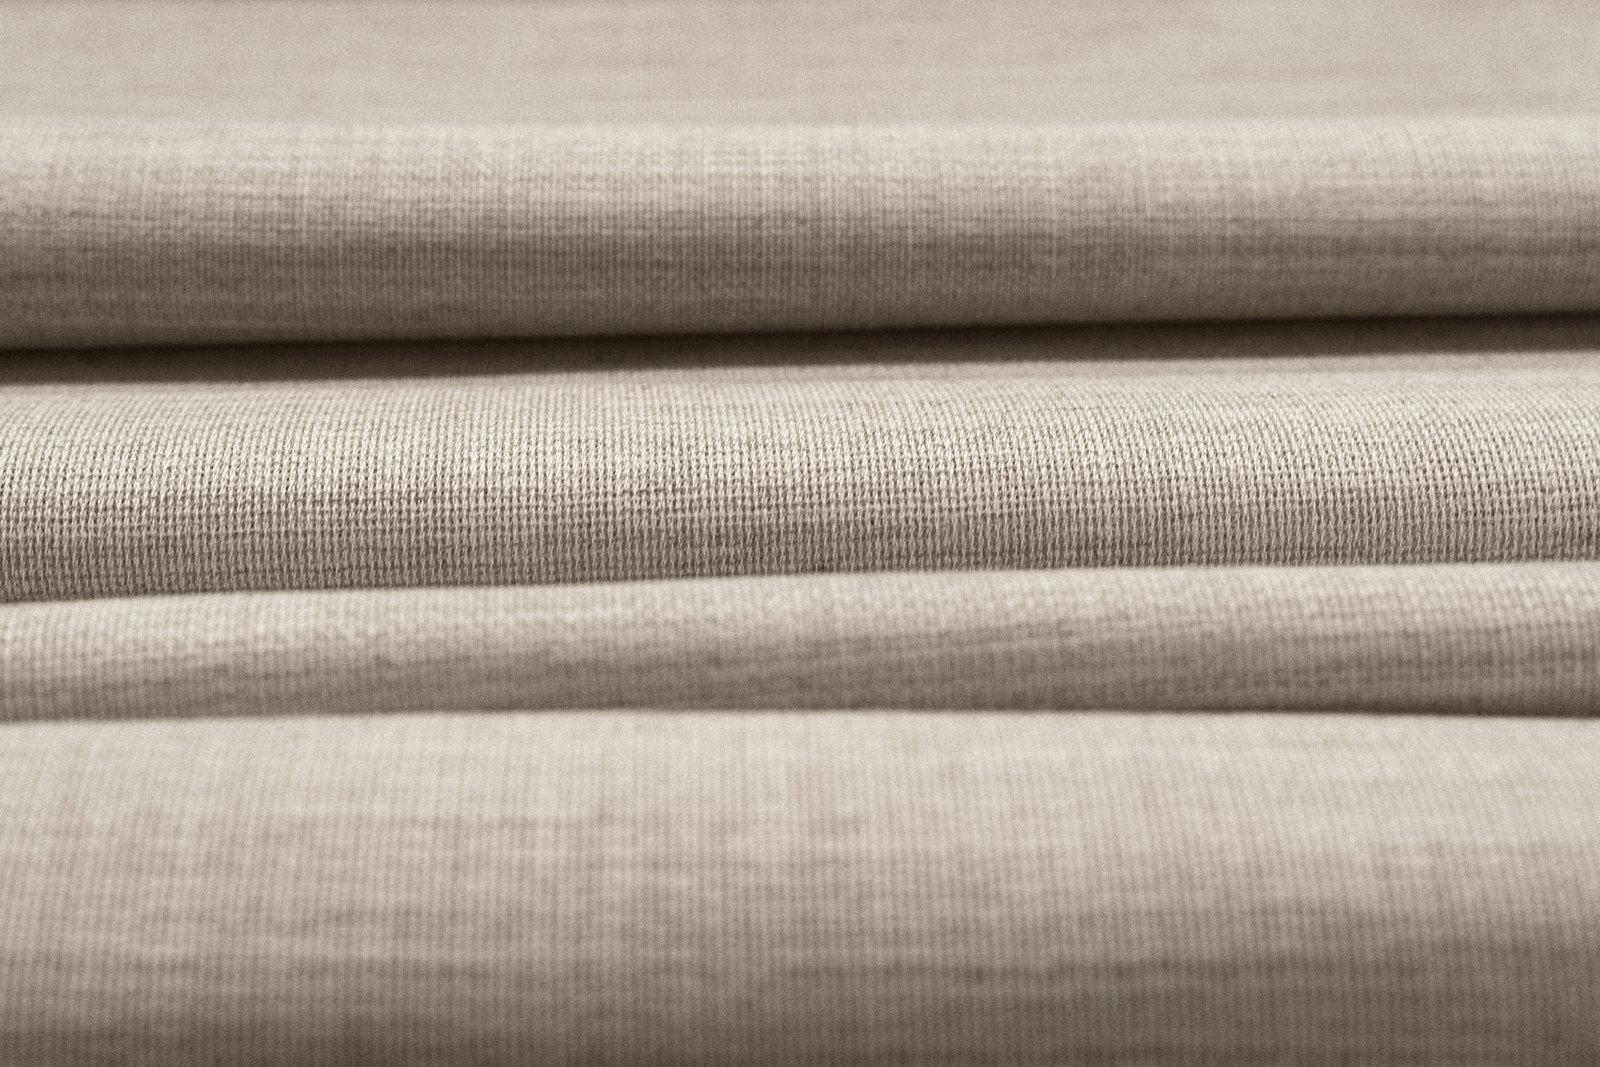 aw20-fox-merino-cloth-1@2x.jpg